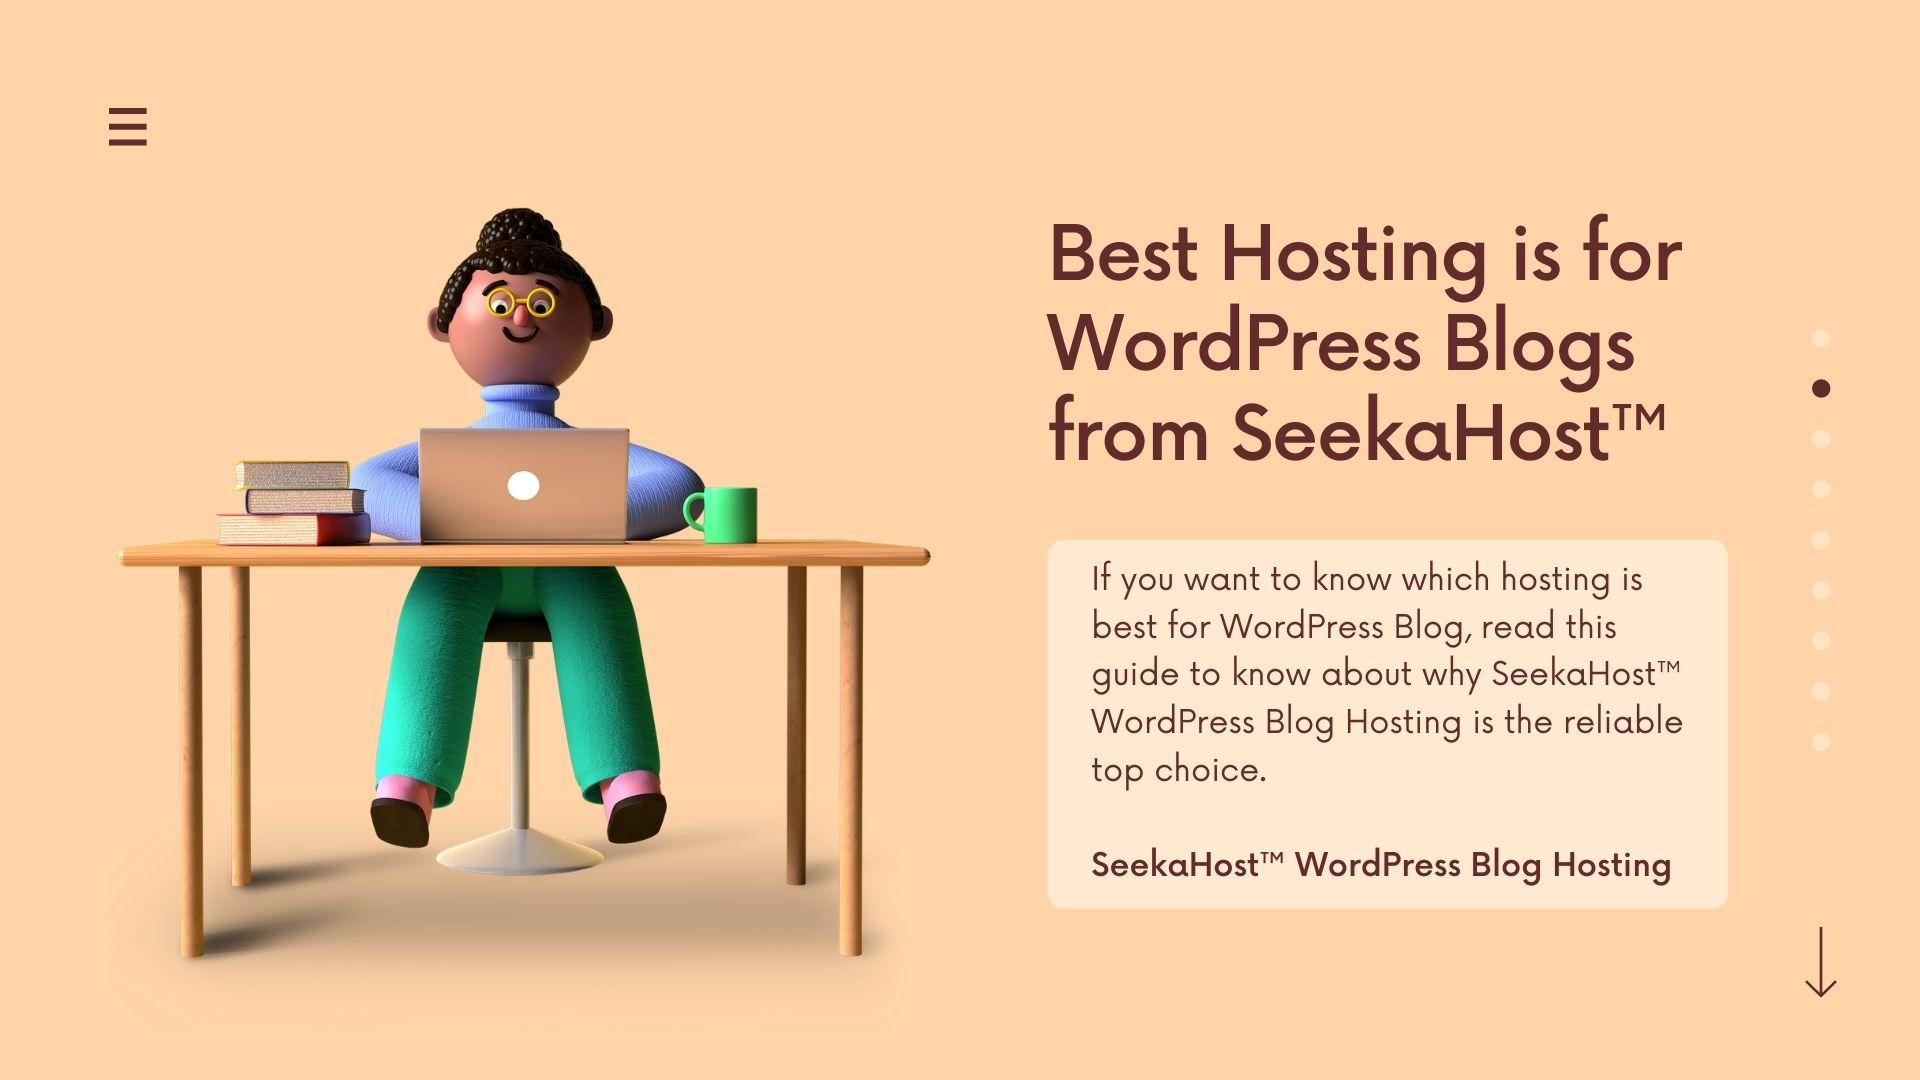 Best-Hosting-is-for-WordPress-Blog